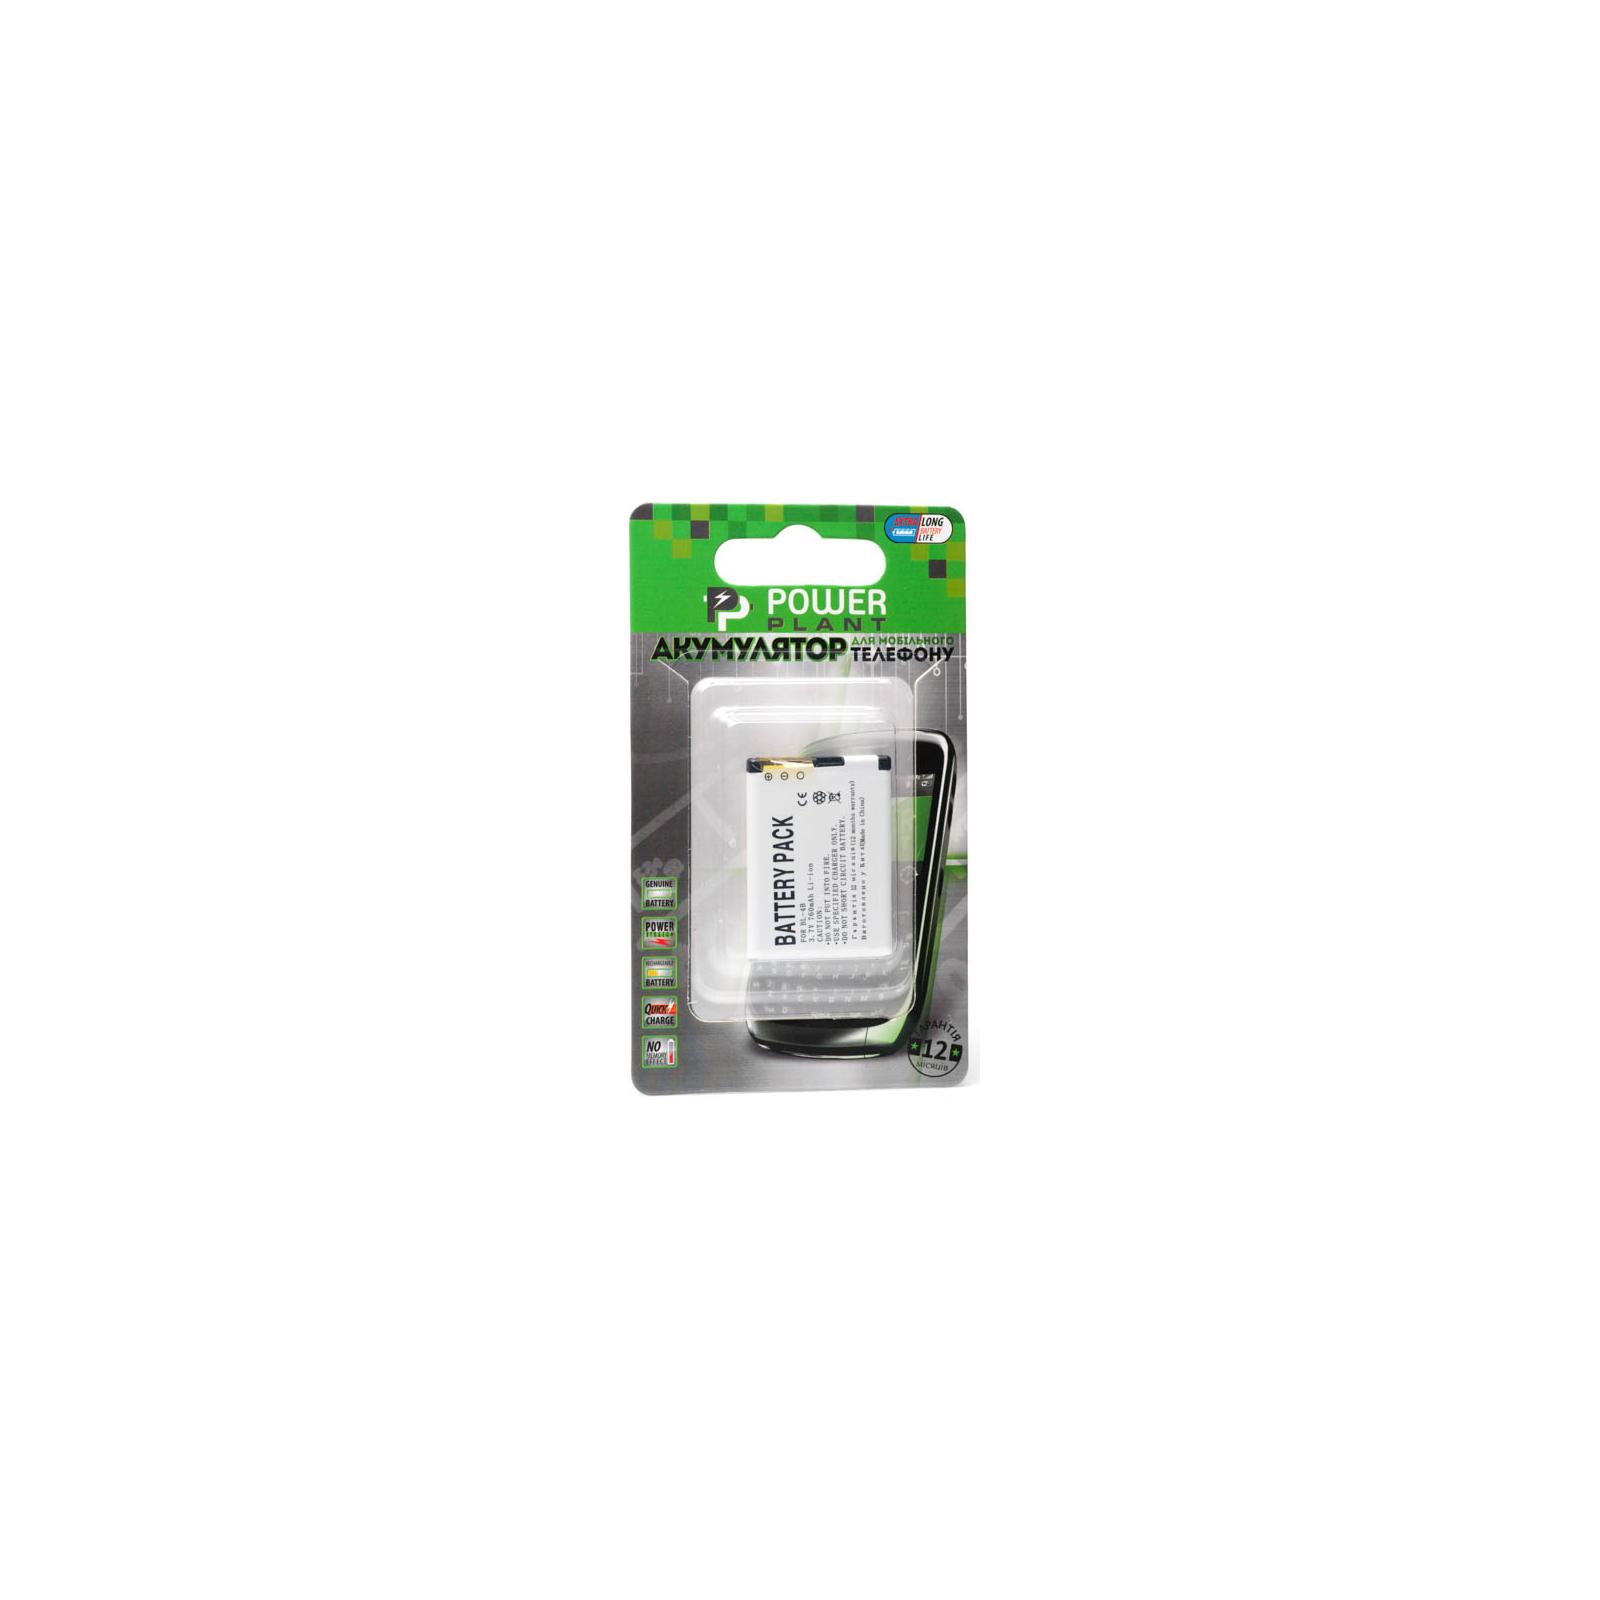 Аккумуляторная батарея PowerPlant Nokia BL-4B (6111, 6230, 7370) (DV00DV1188)